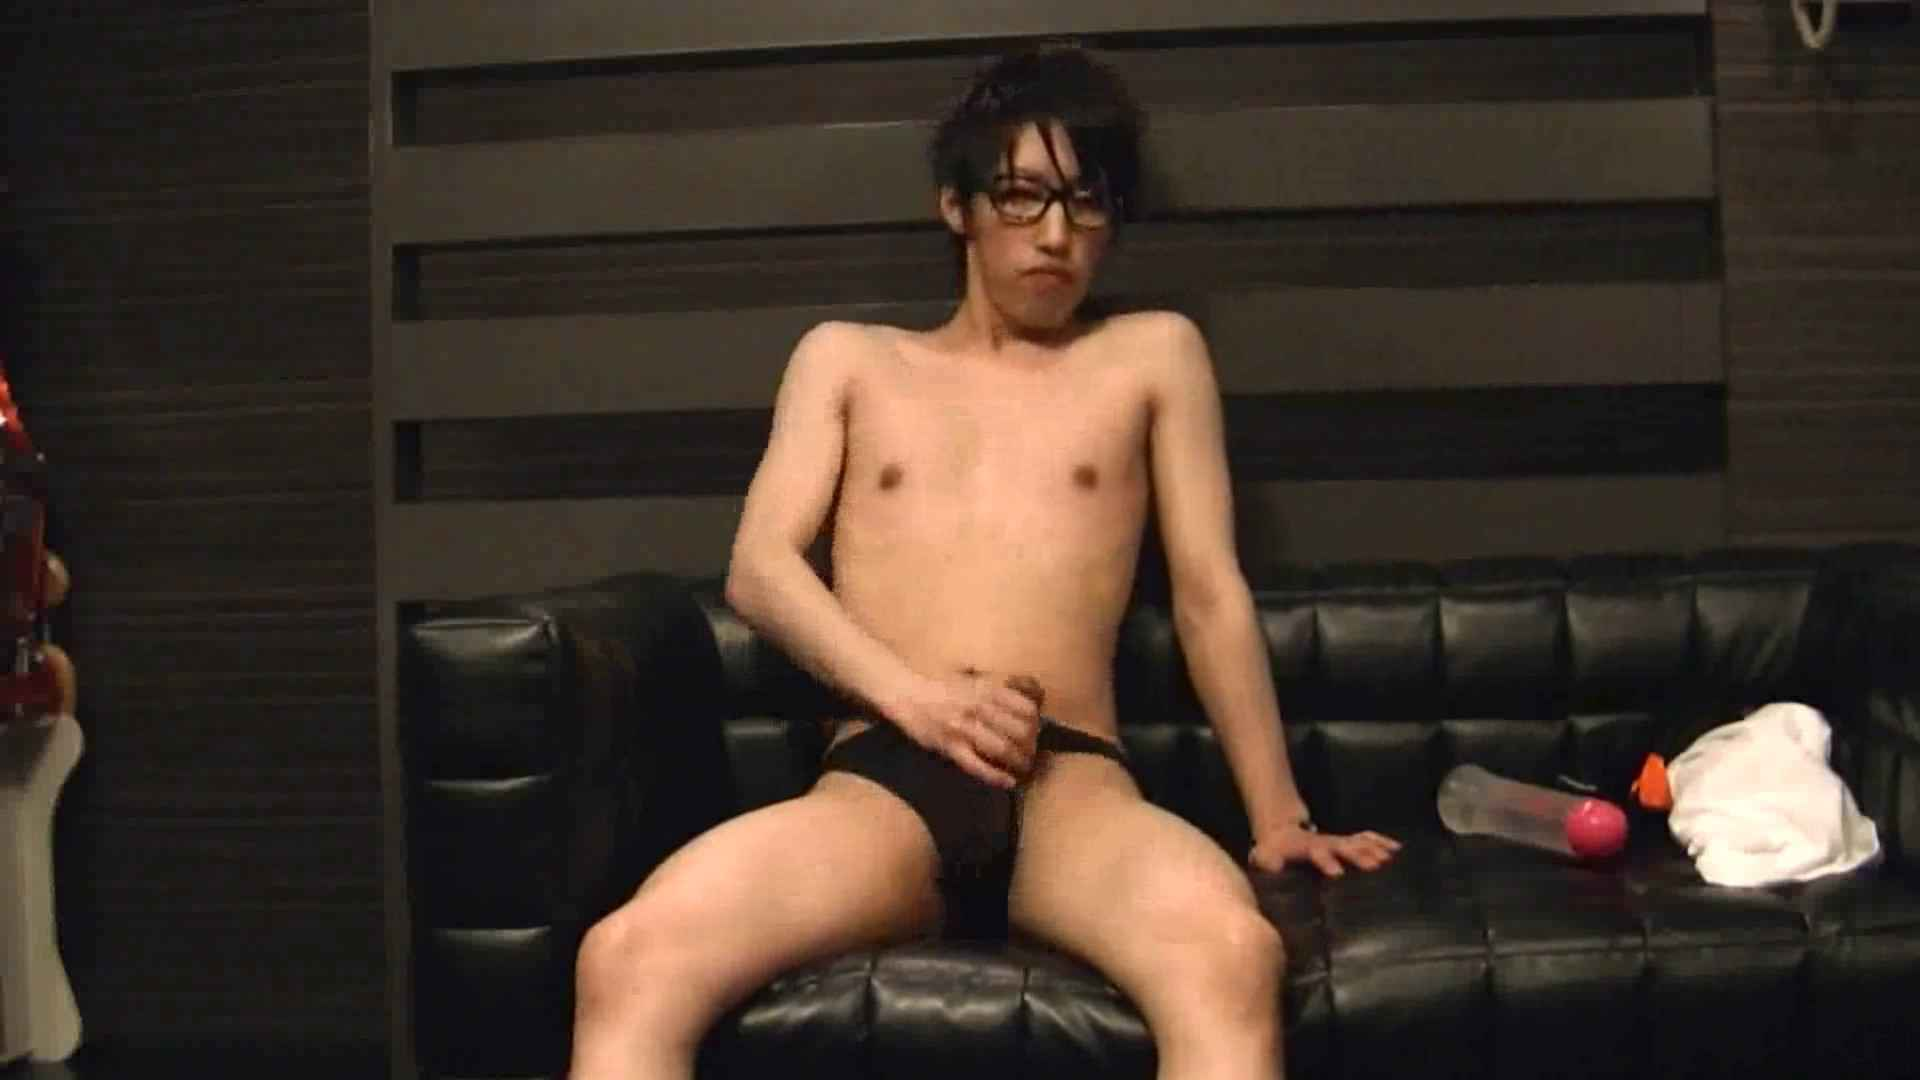 ONA見せカーニバル!! Vol3 男  93pic 37